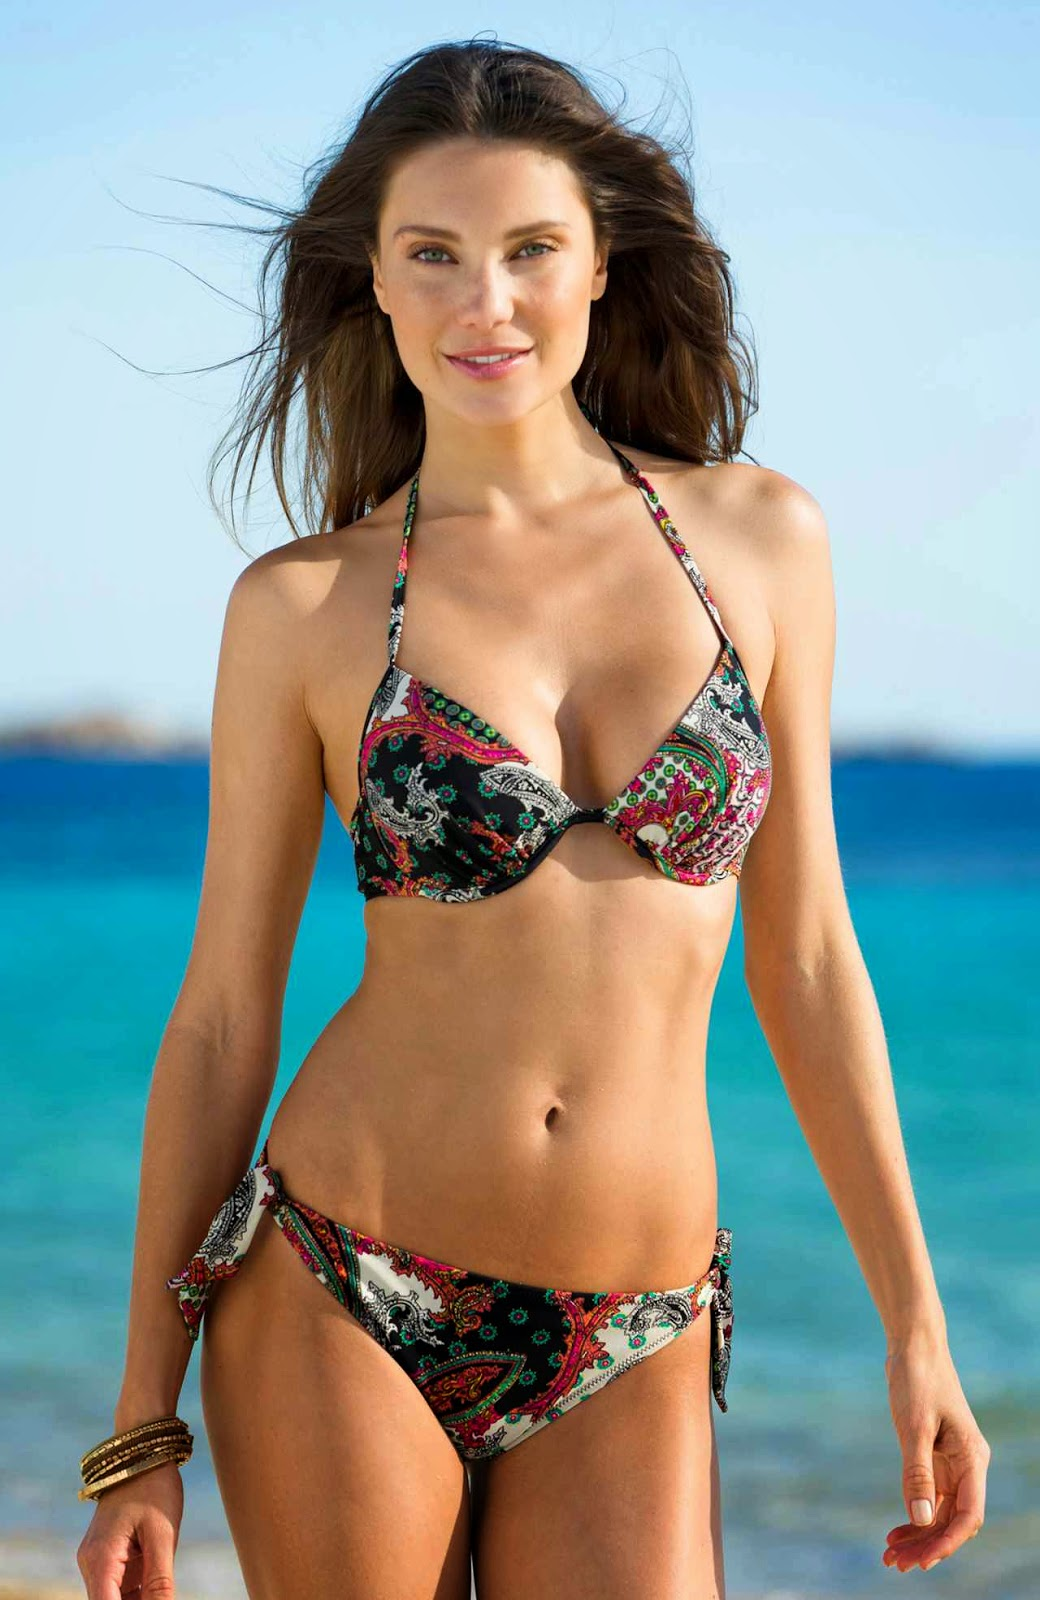 Celebrity Julia Pereira nudes (81 photo), Sexy, Bikini, Instagram, panties 2019